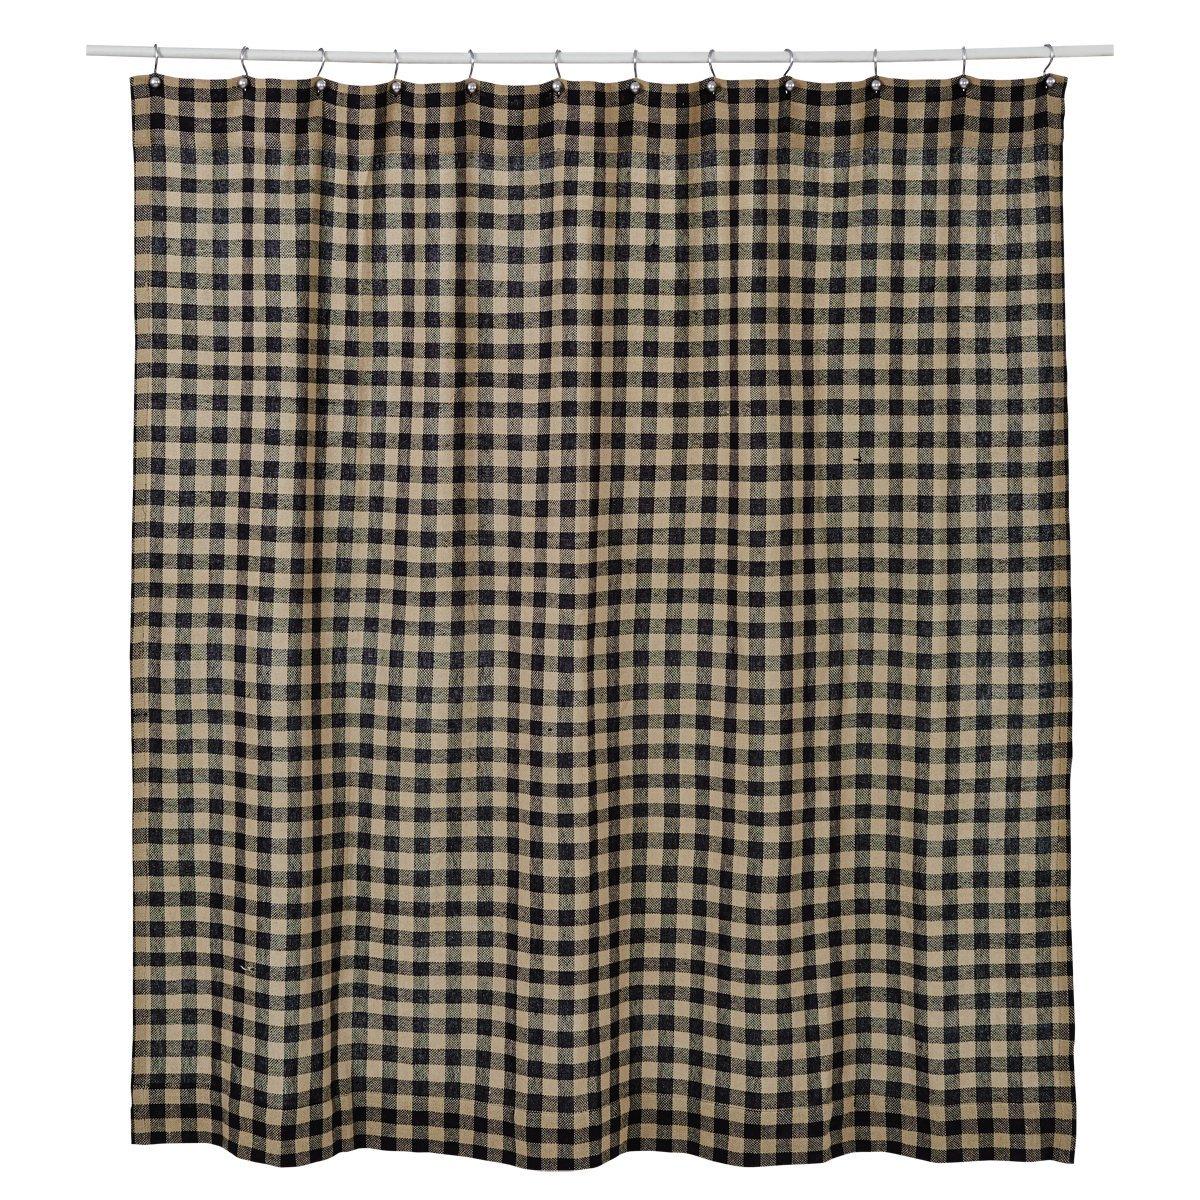 Black And Blue Shower Curtain Part - 25: Amazon.com: VHC Brands Burlap Black Check Shower Curtain 72x72: Home U0026  Kitchen